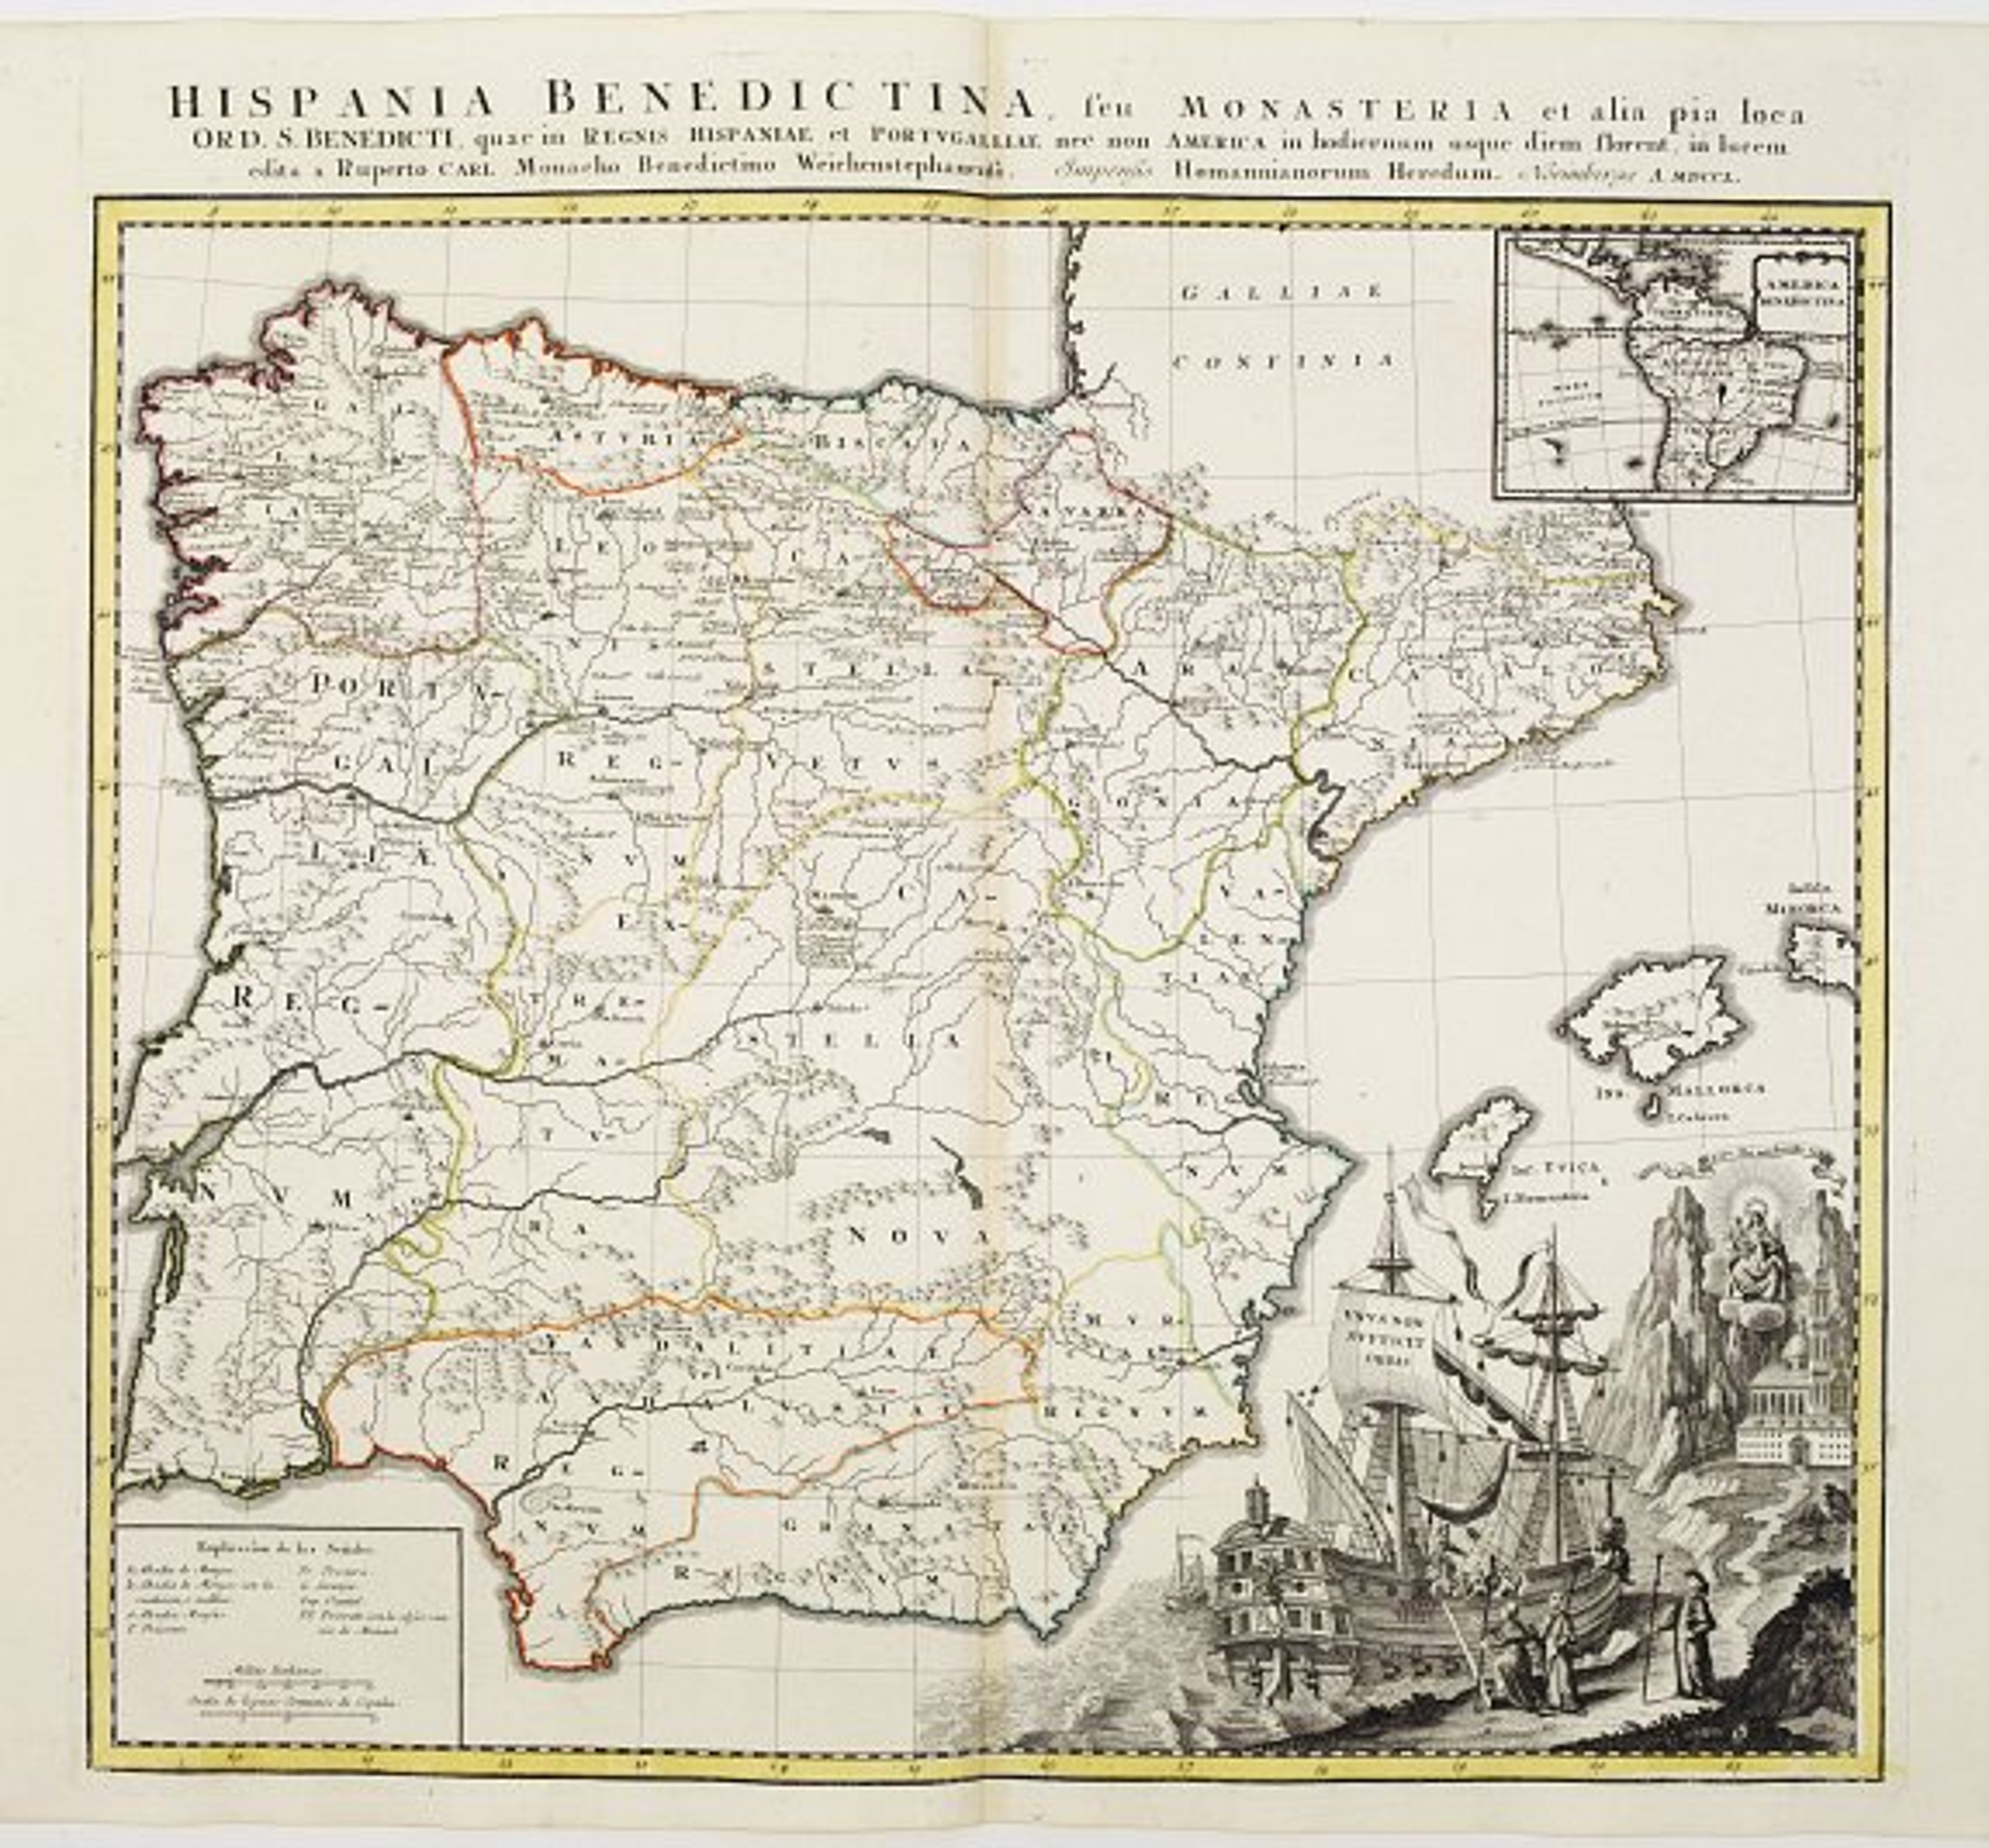 HOMANN, J.B. -  Hispania Benedictina, seu Monasteria et alia pia loca Ord. S. Benedicti ..